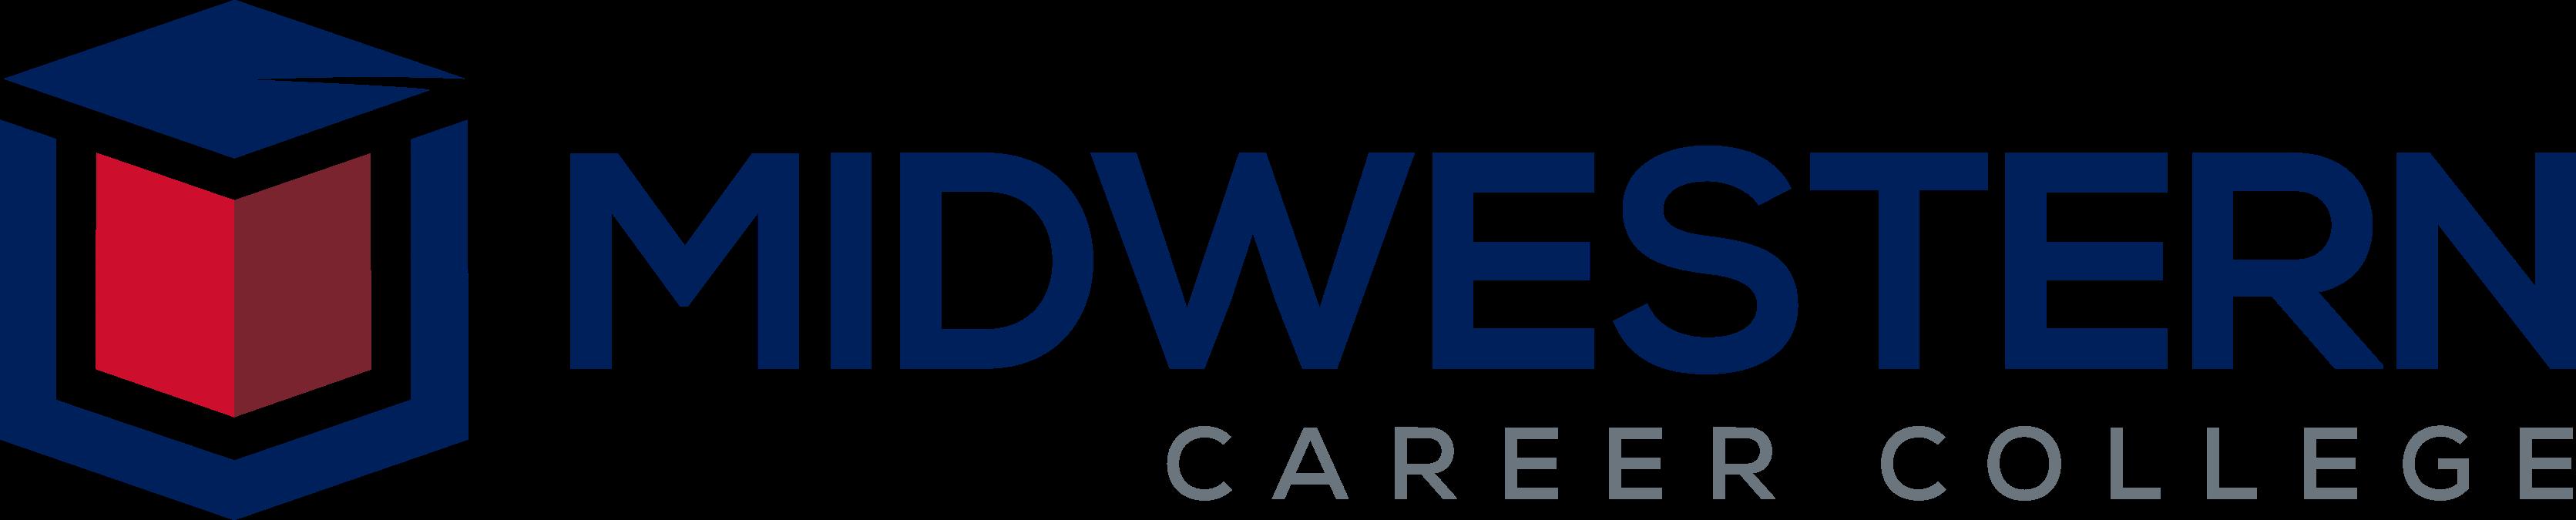 Midwestern Career College Logo